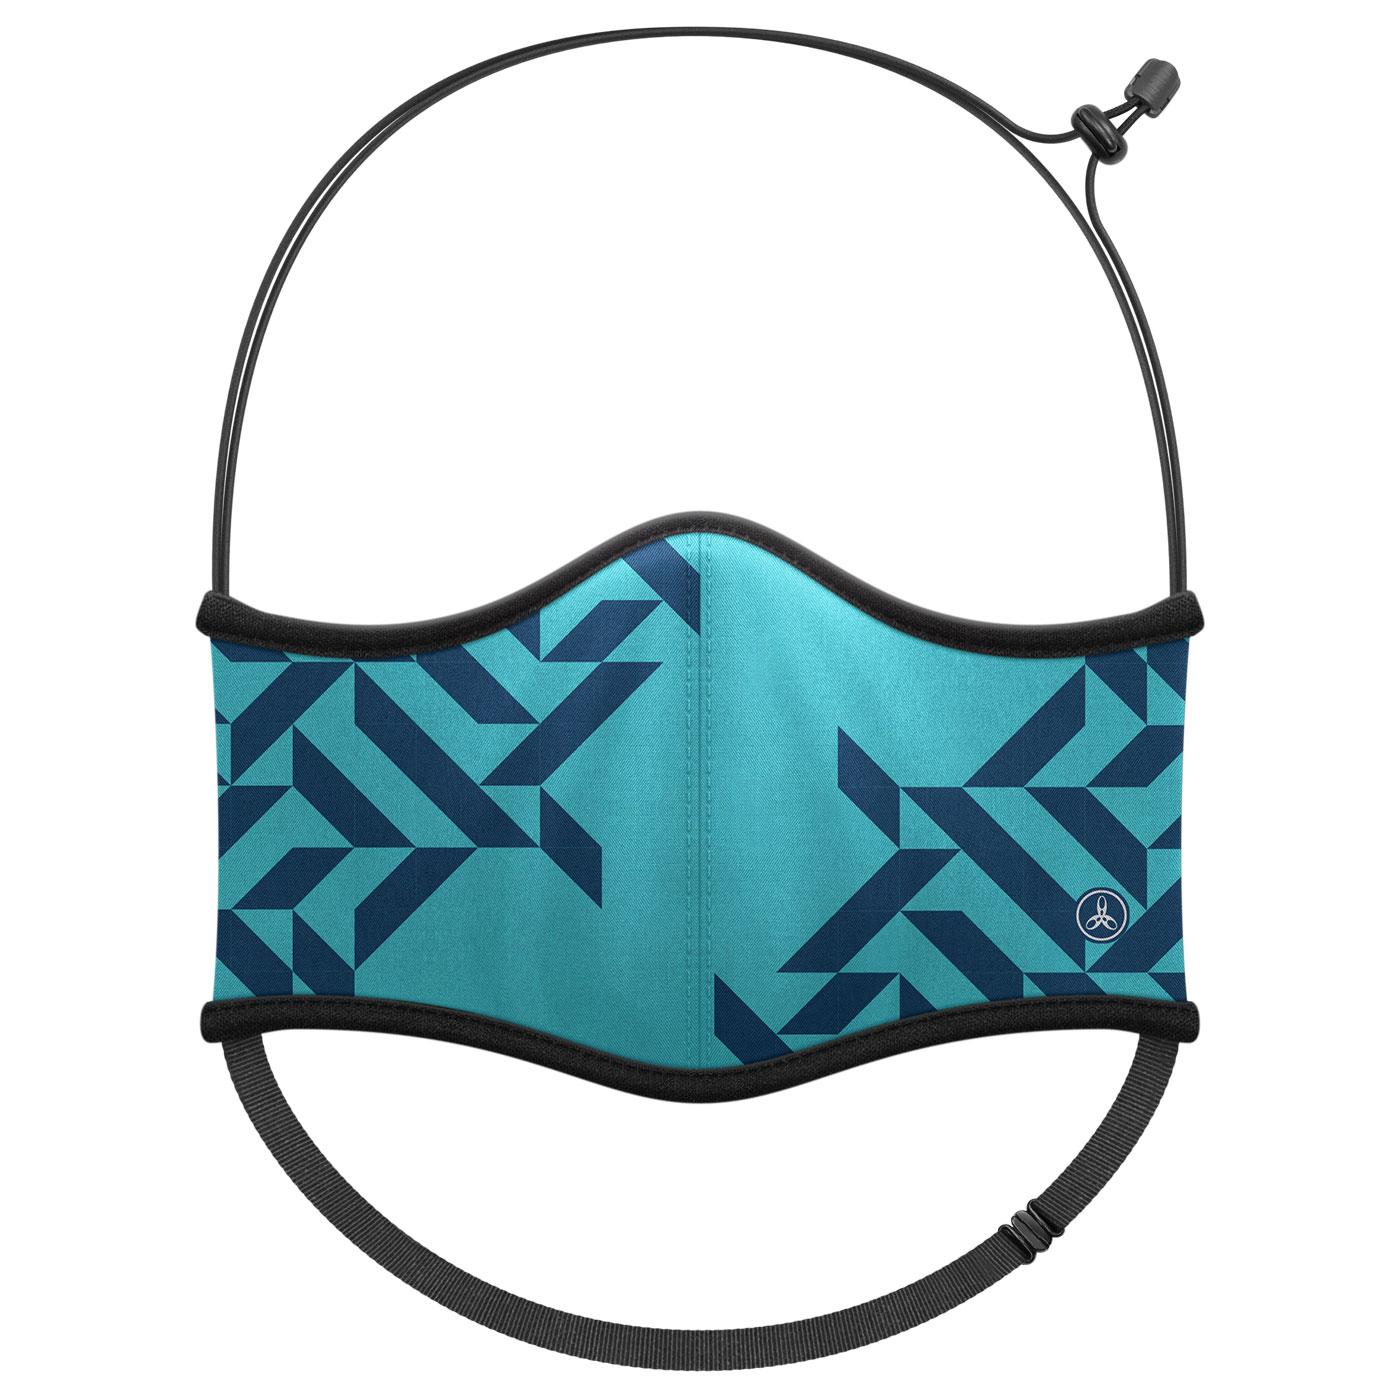 HODARLA 運動舒適口罩6032225 - 湖水藍